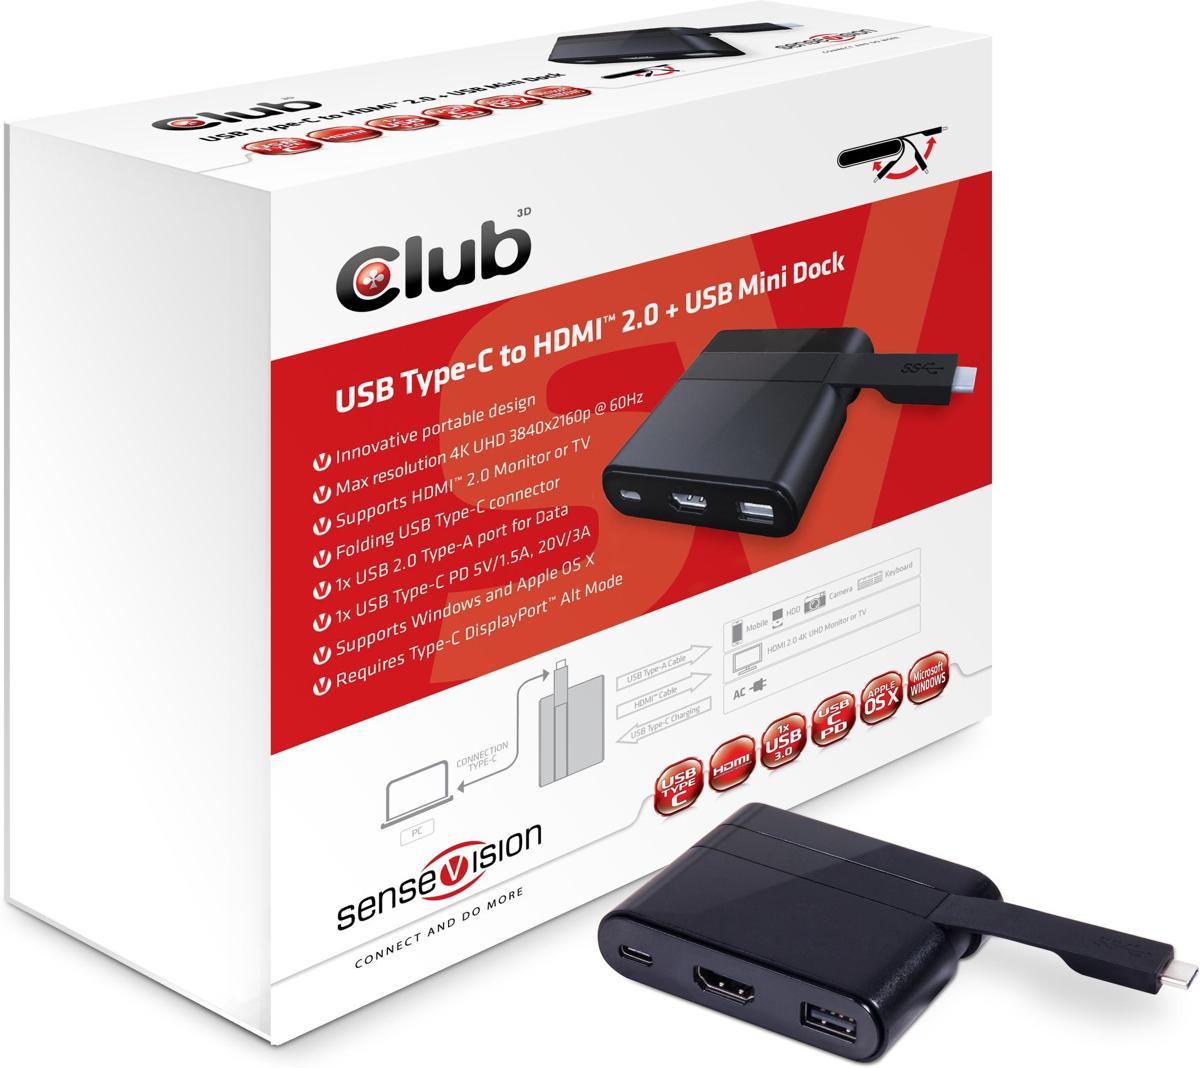 MINI USB 3.0 TYPE C DOCKING STATIONHDMI